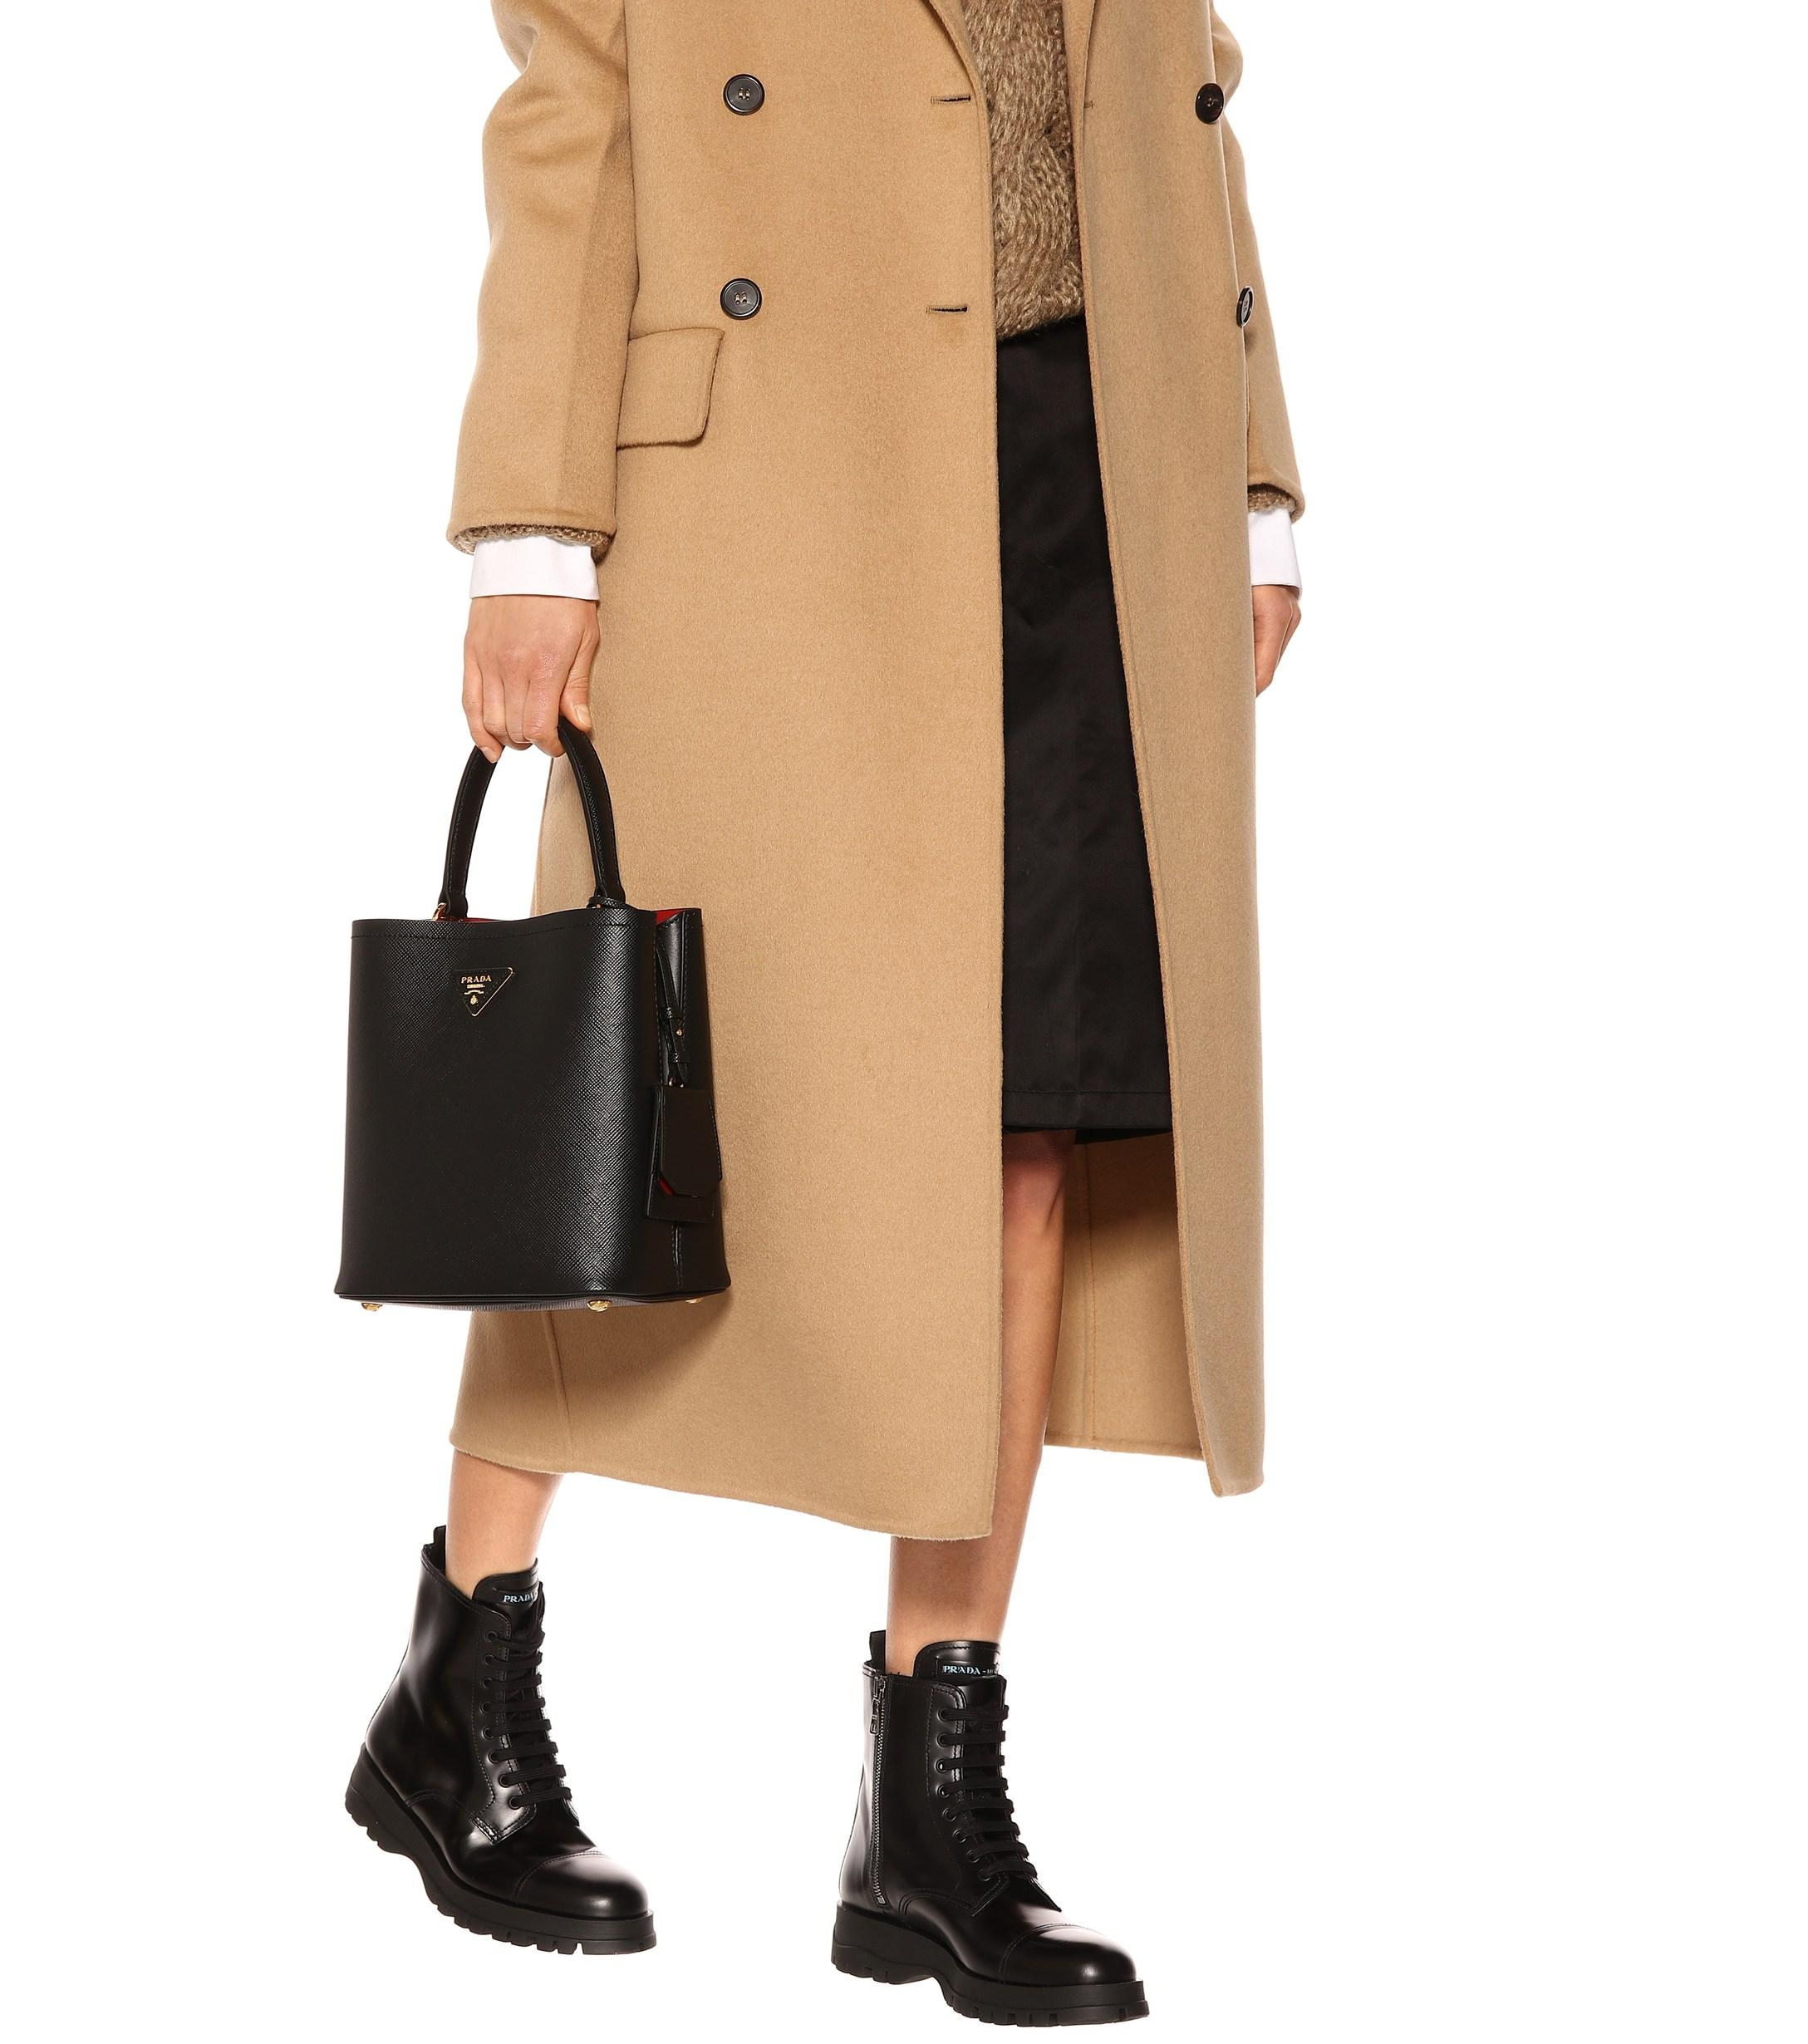 abb6072a2548 ... Panier Medium Leather Shoulder Bag - Lyst. View fullscreen